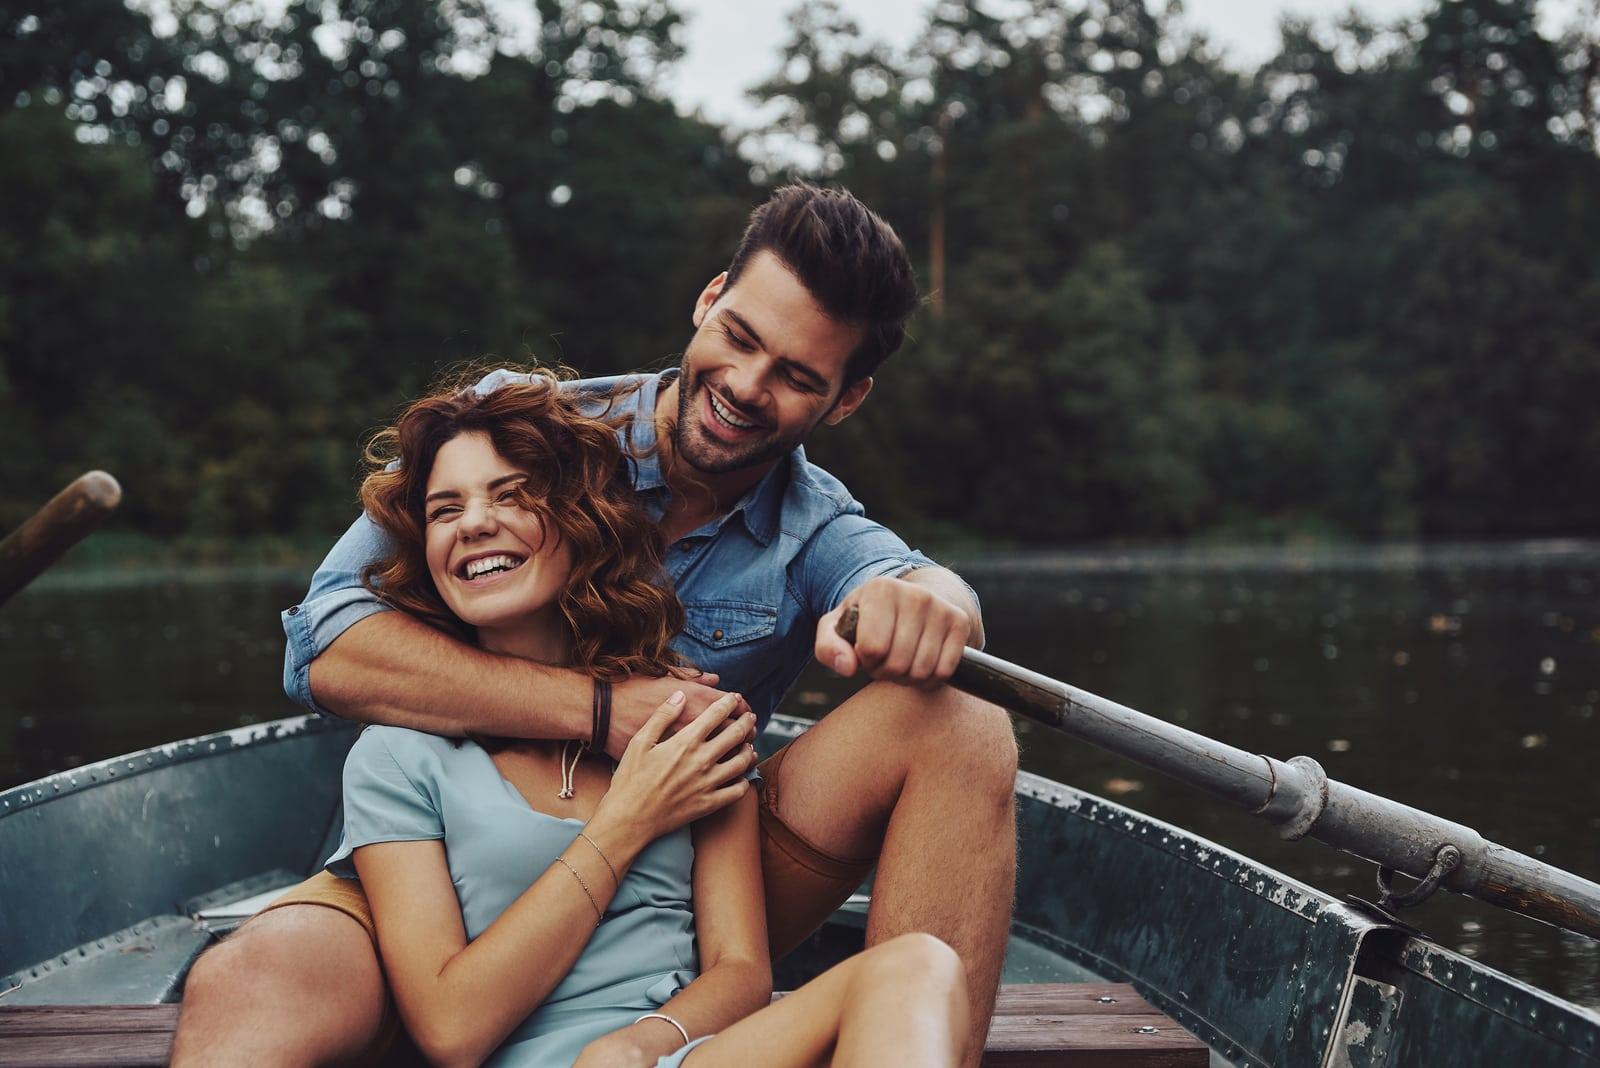 the couple in love enjoys kayaking